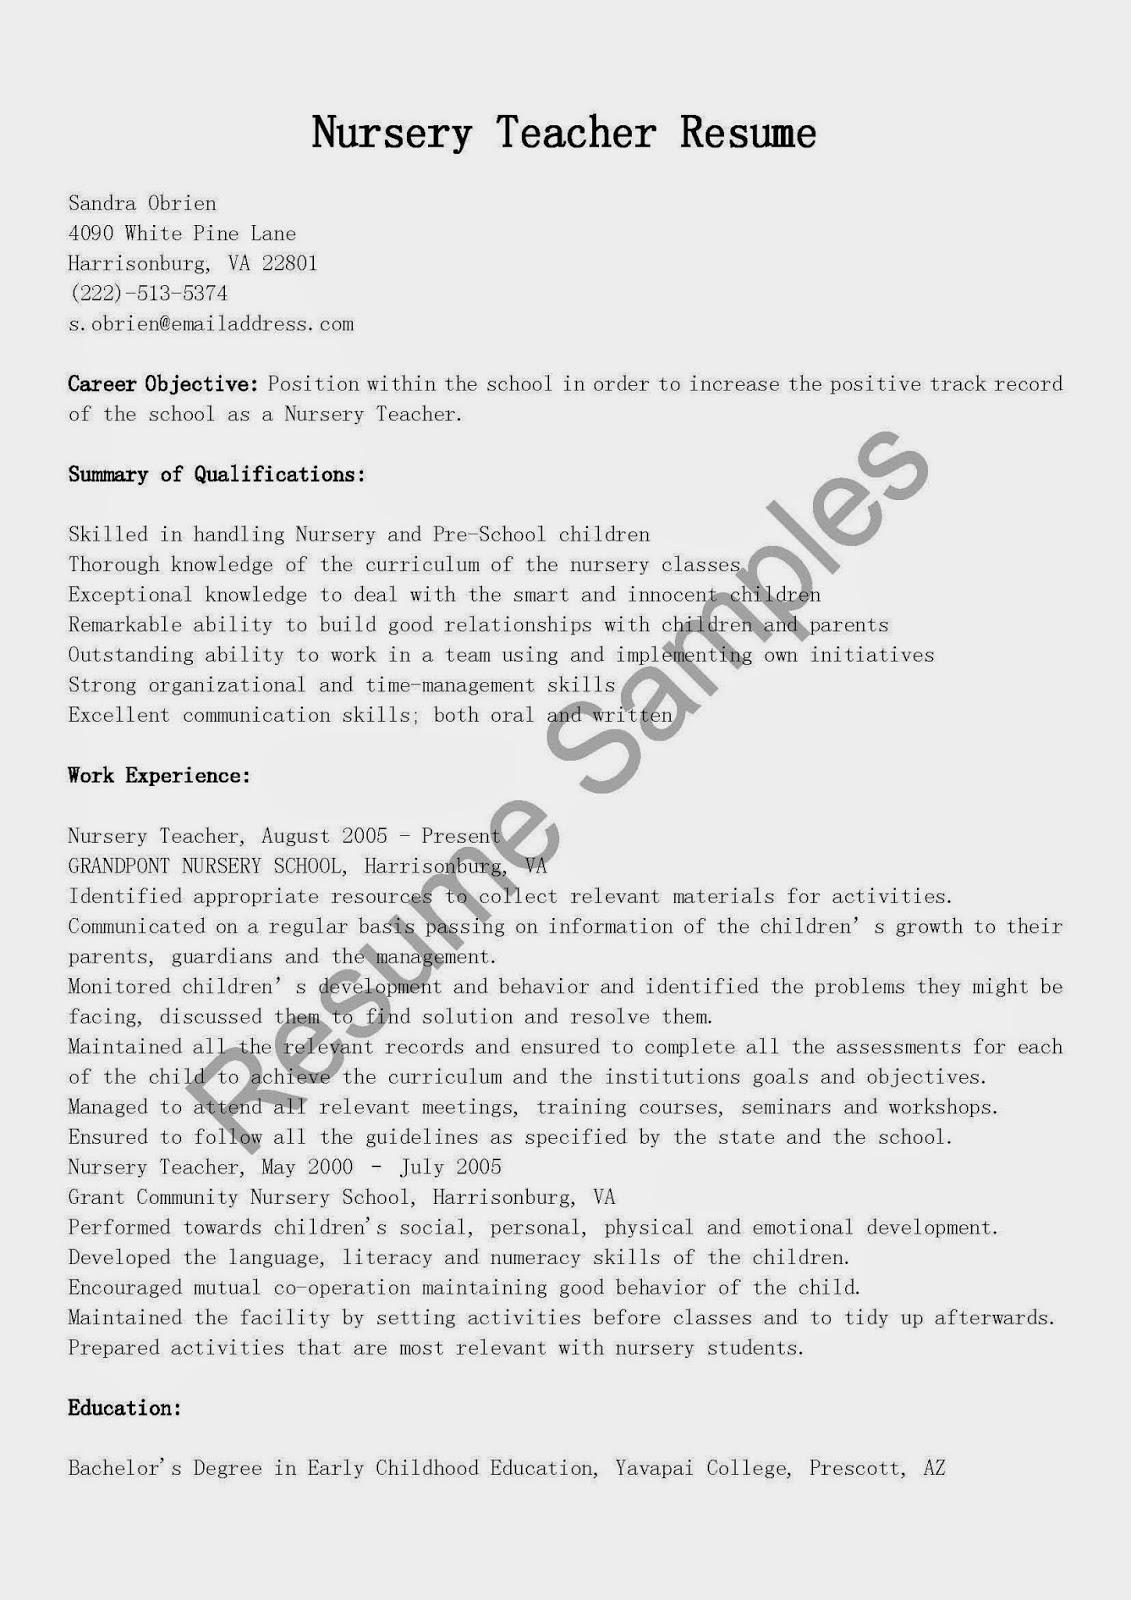 resume samples  nursery teacher resume sample